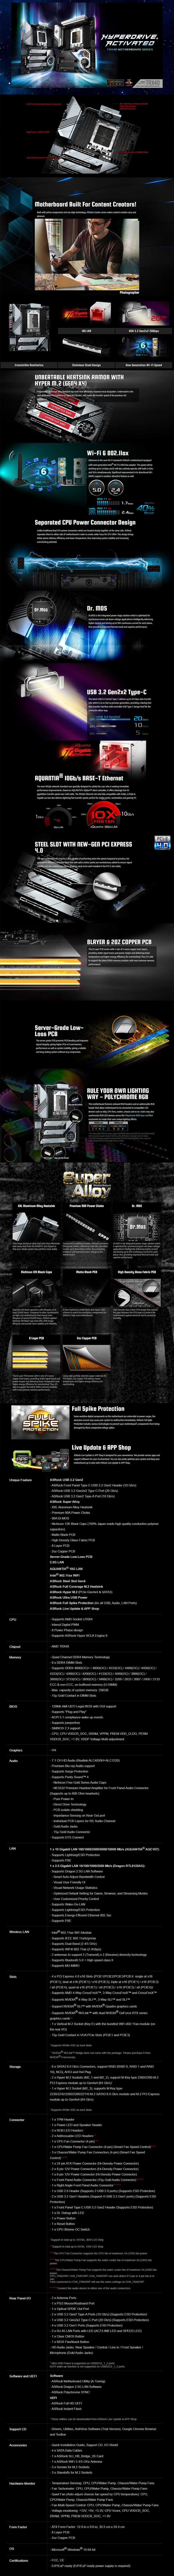 ASRock TRX40 Creator sTRX4 ATX Motherboard - Overview 1